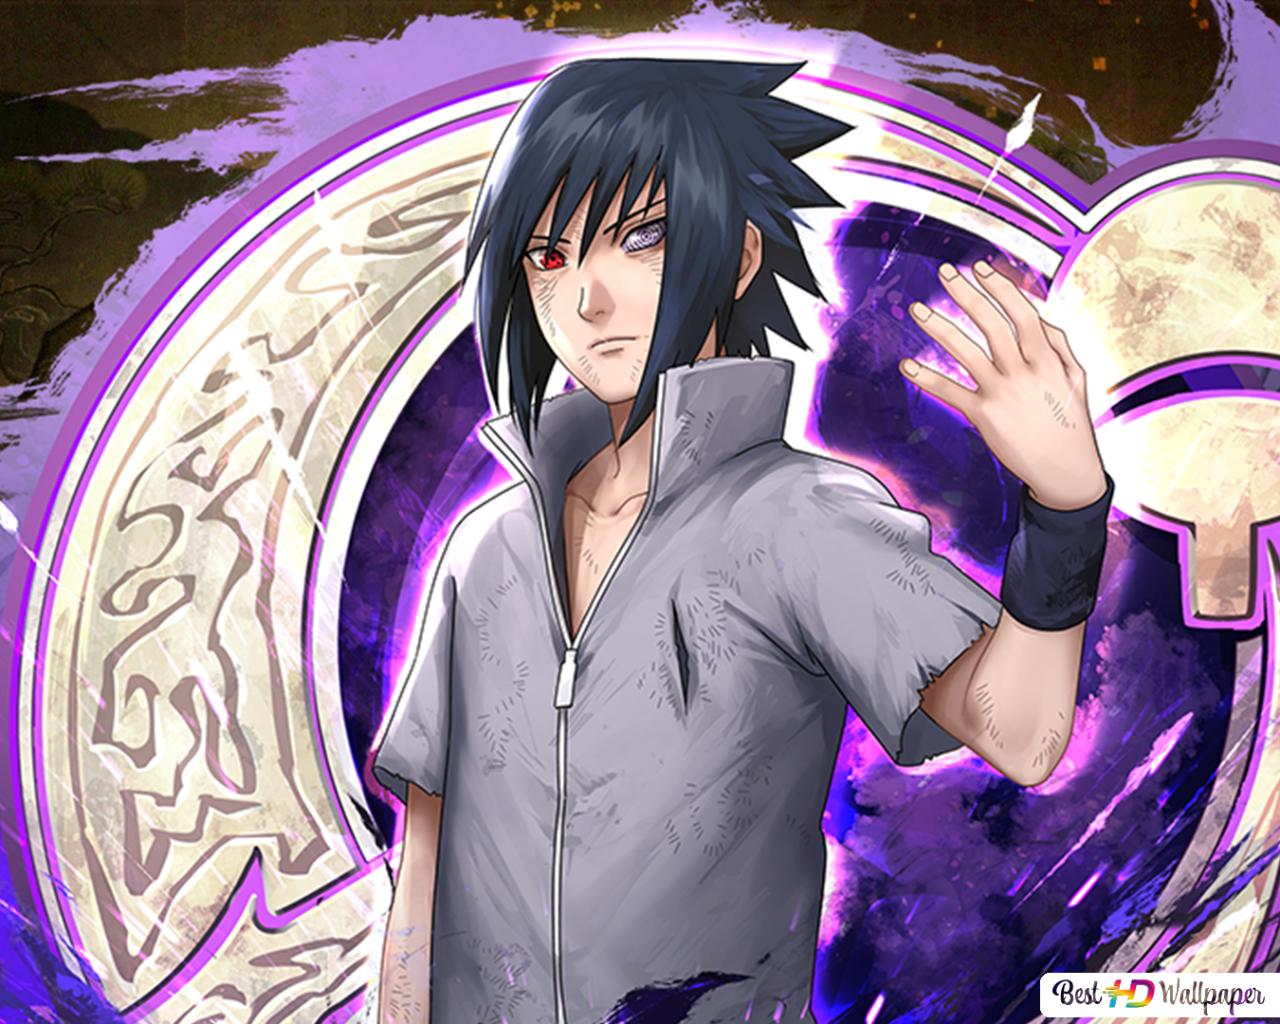 Sasuke Uchiha Rinnegan From Naruto Shippuden For Desktop Hd Wallpaper Download